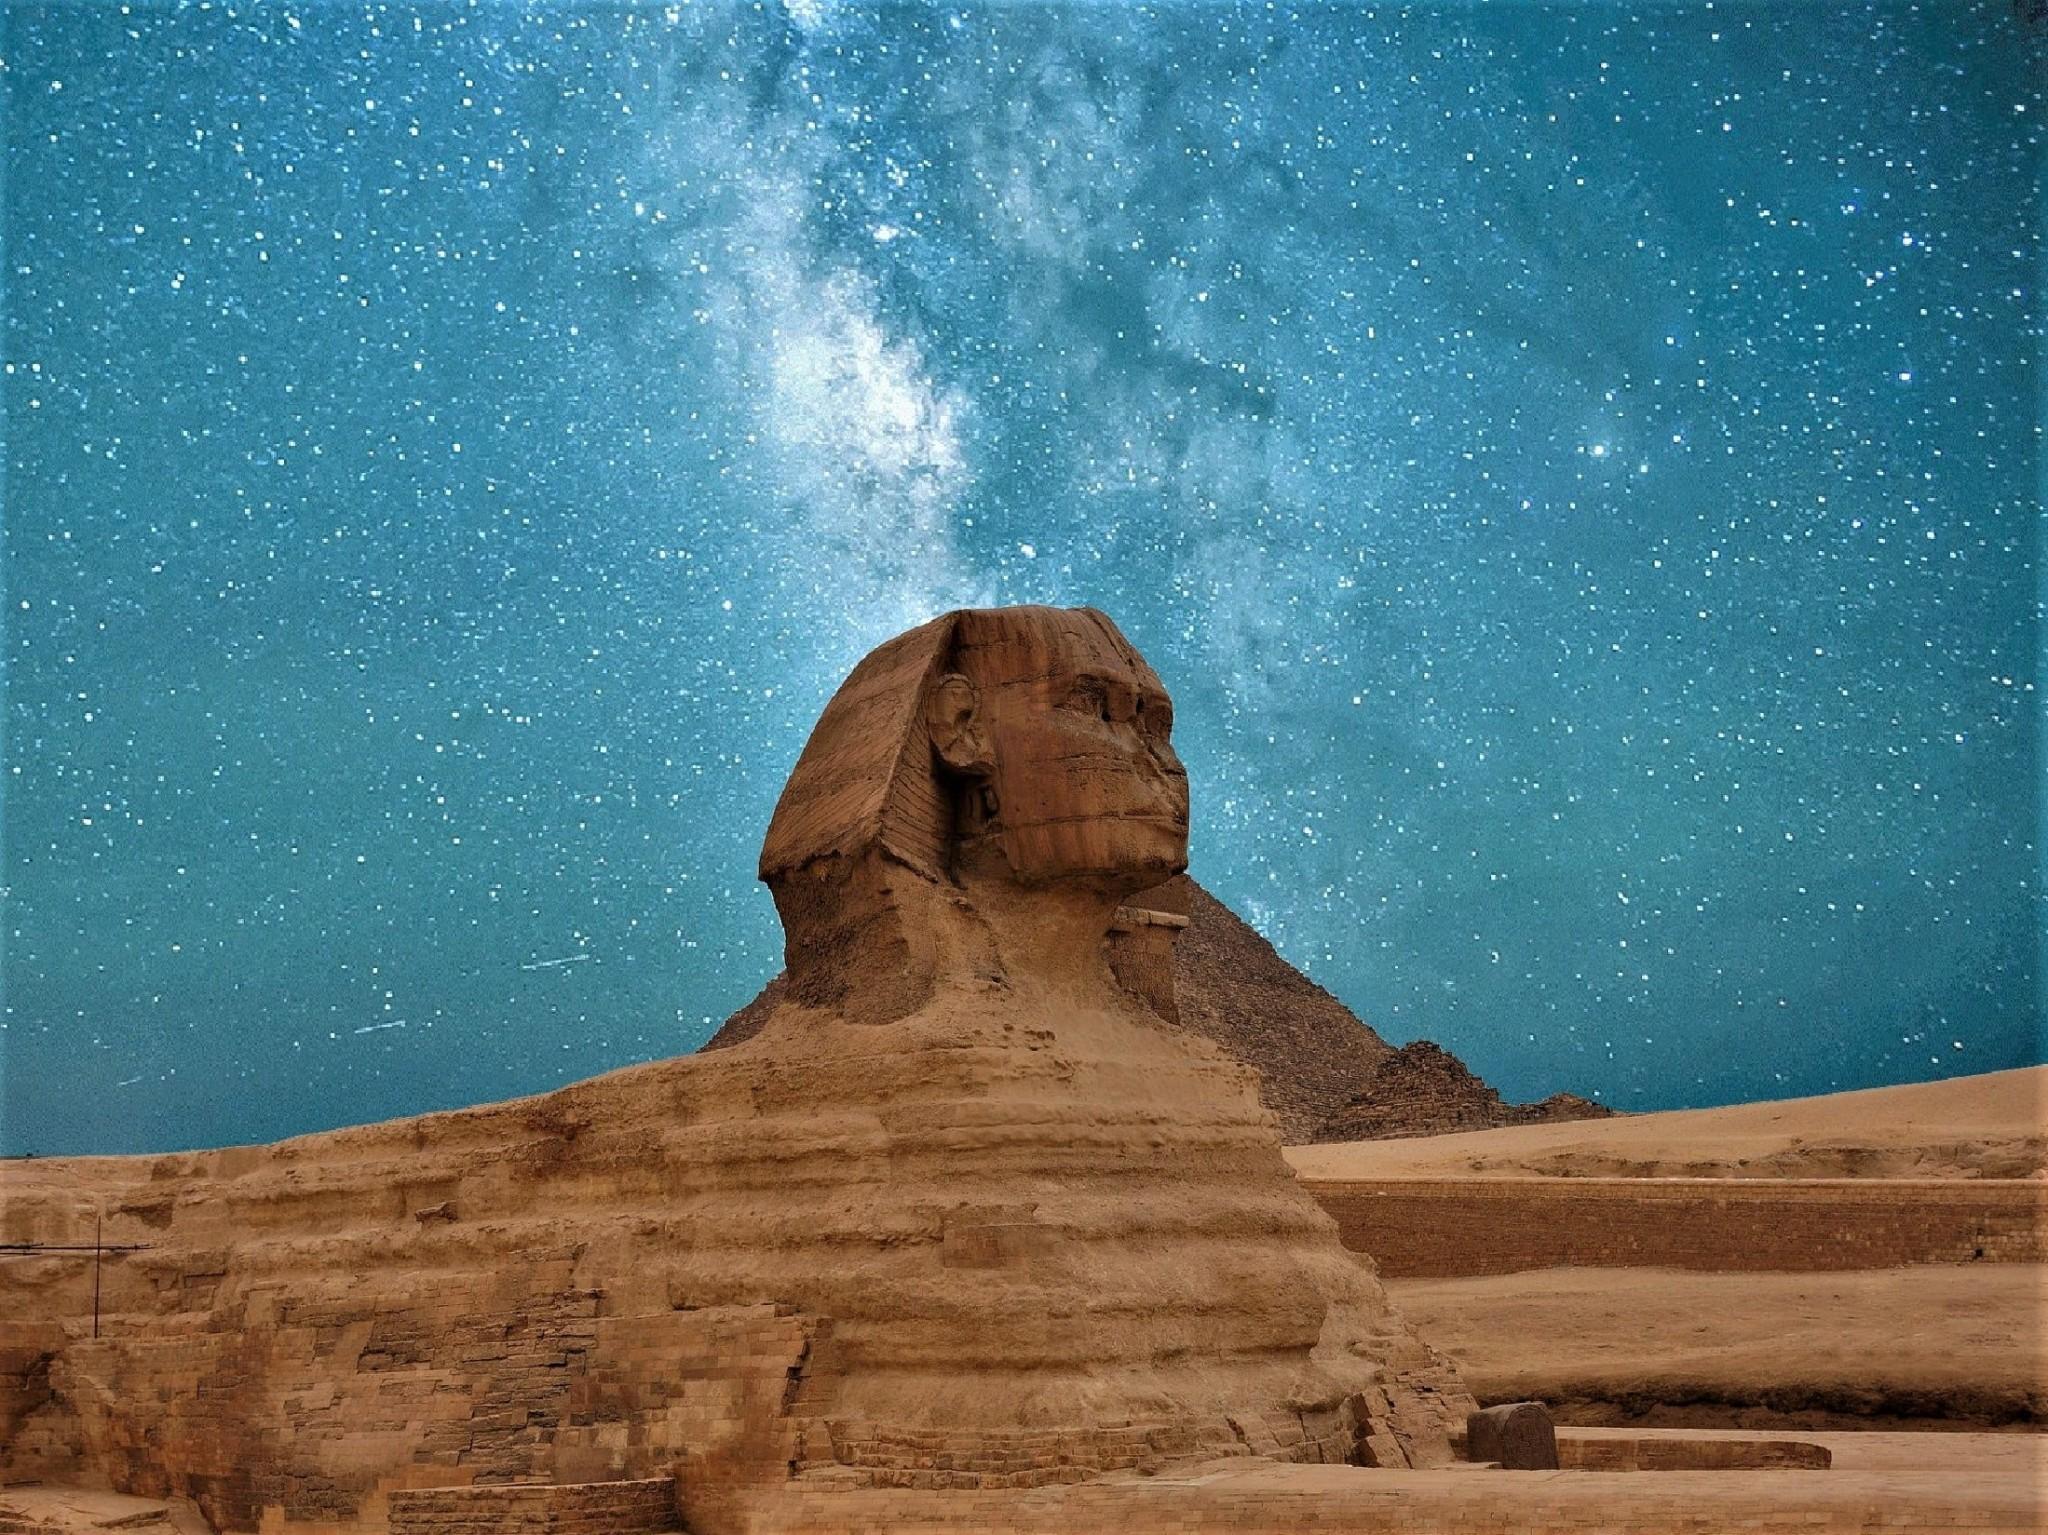 Egyptian sphinx gazing into a starry night sky.